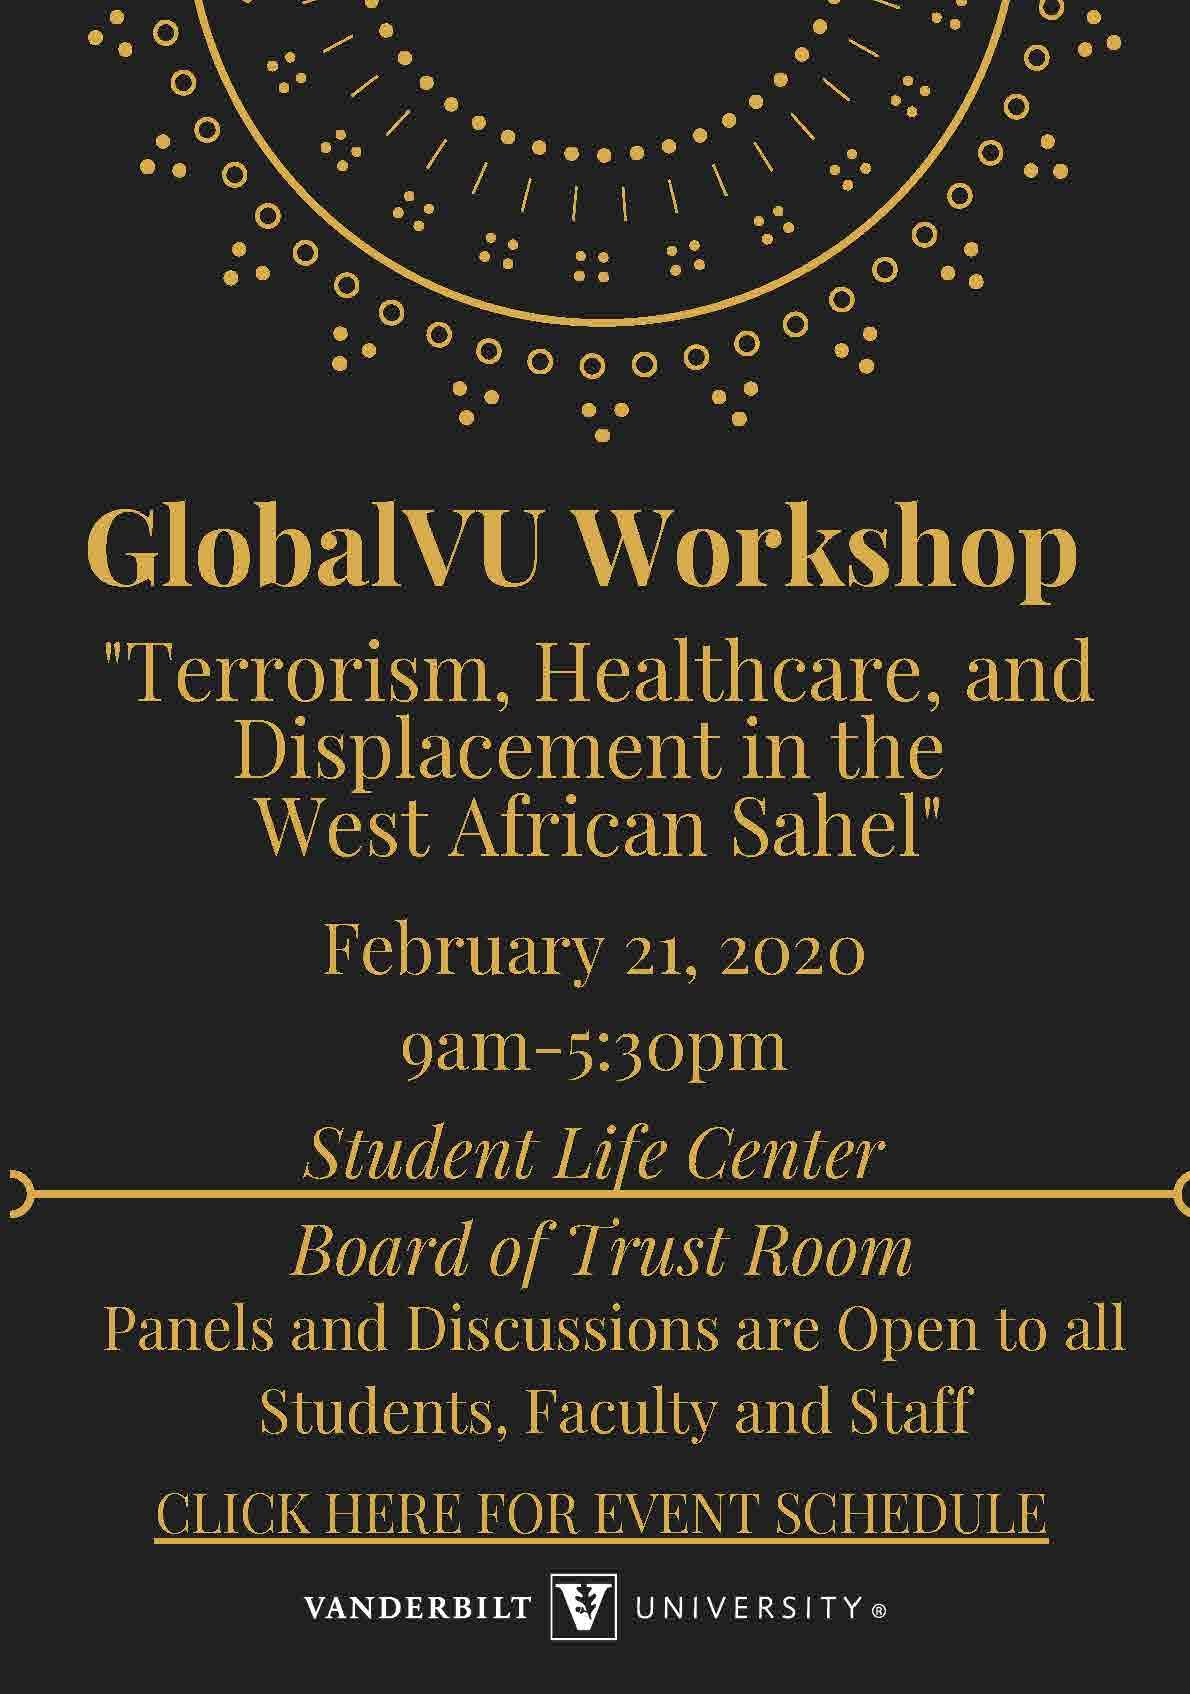 GlobalVU Workshop